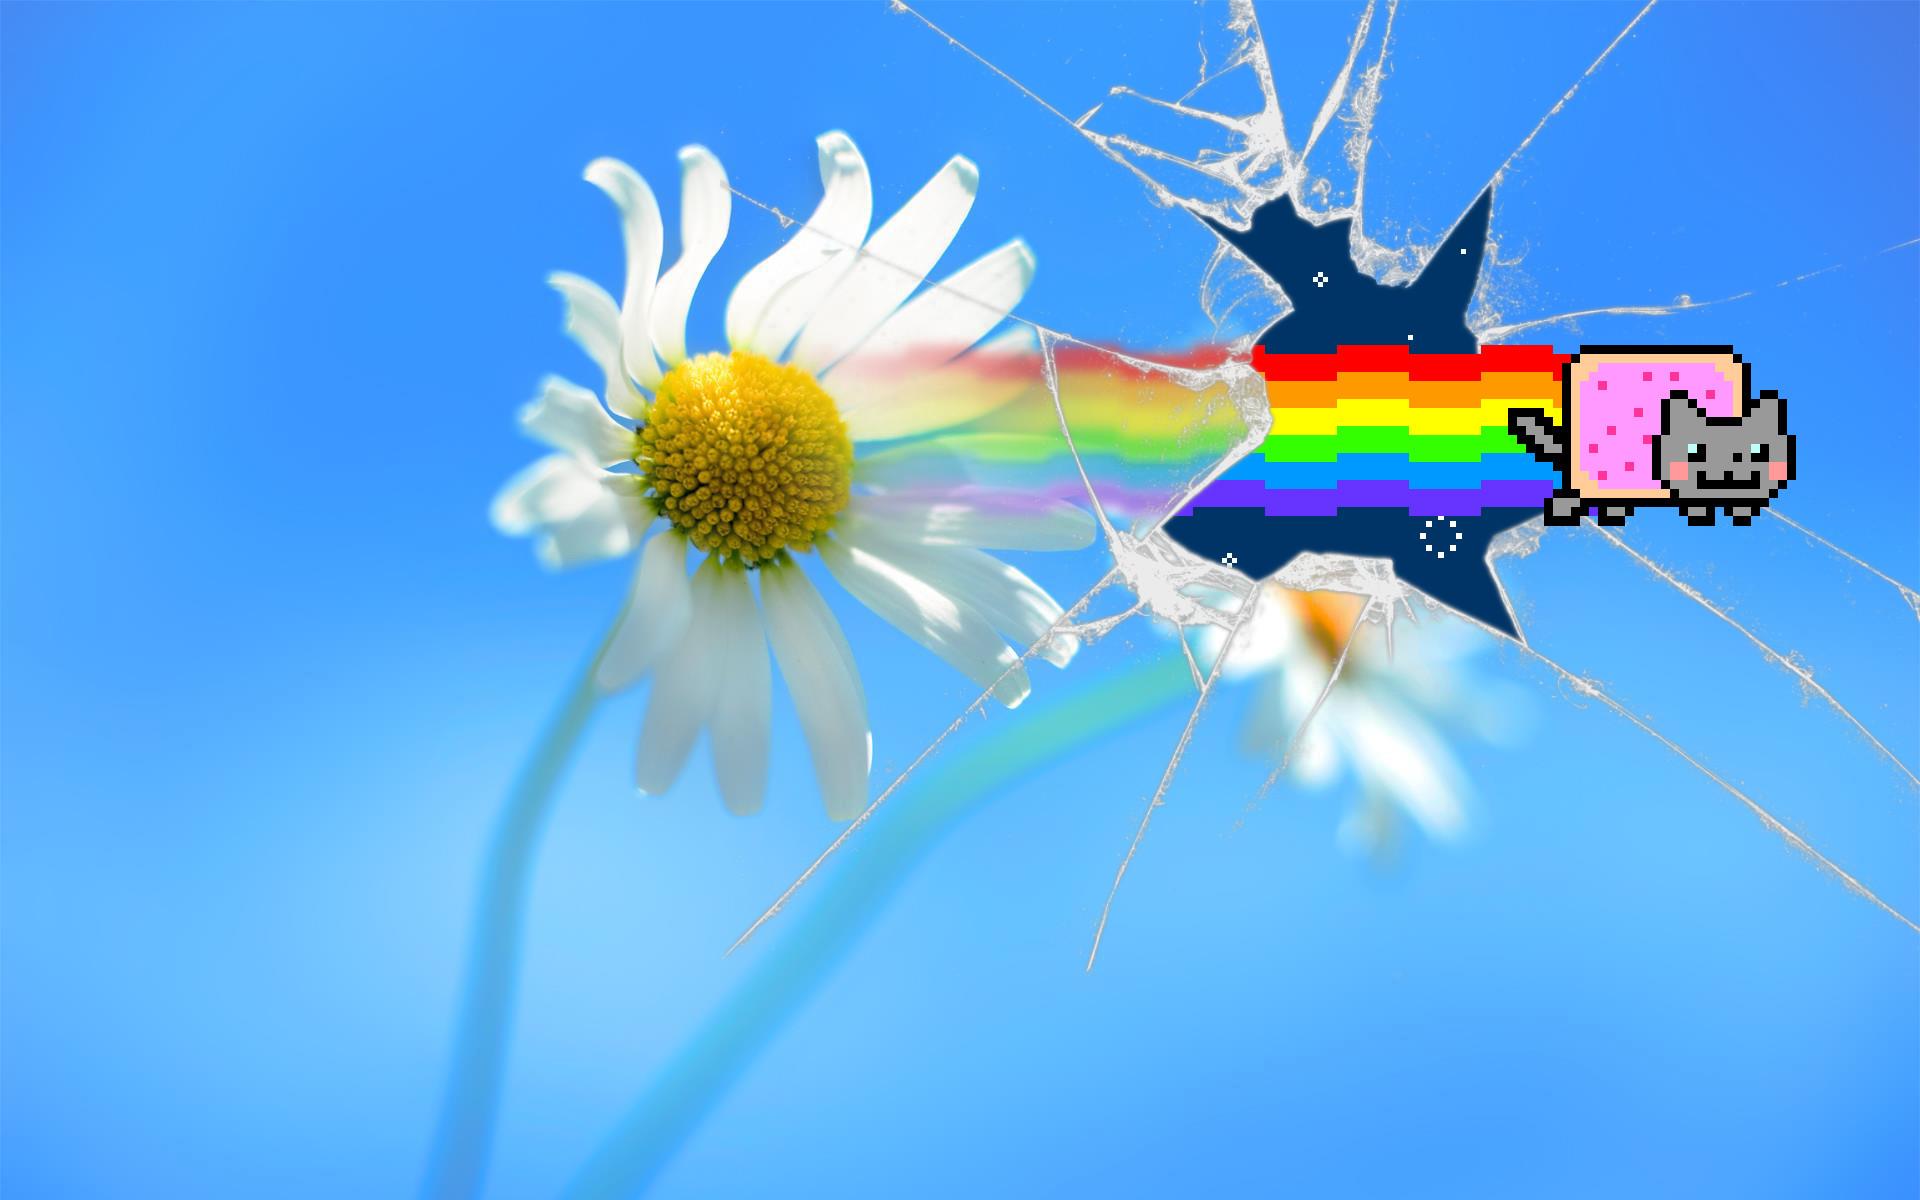 Res: 1920x1200, Nyan Cat Galaxy Wallpaper By Sonyrootkit On Deviantart